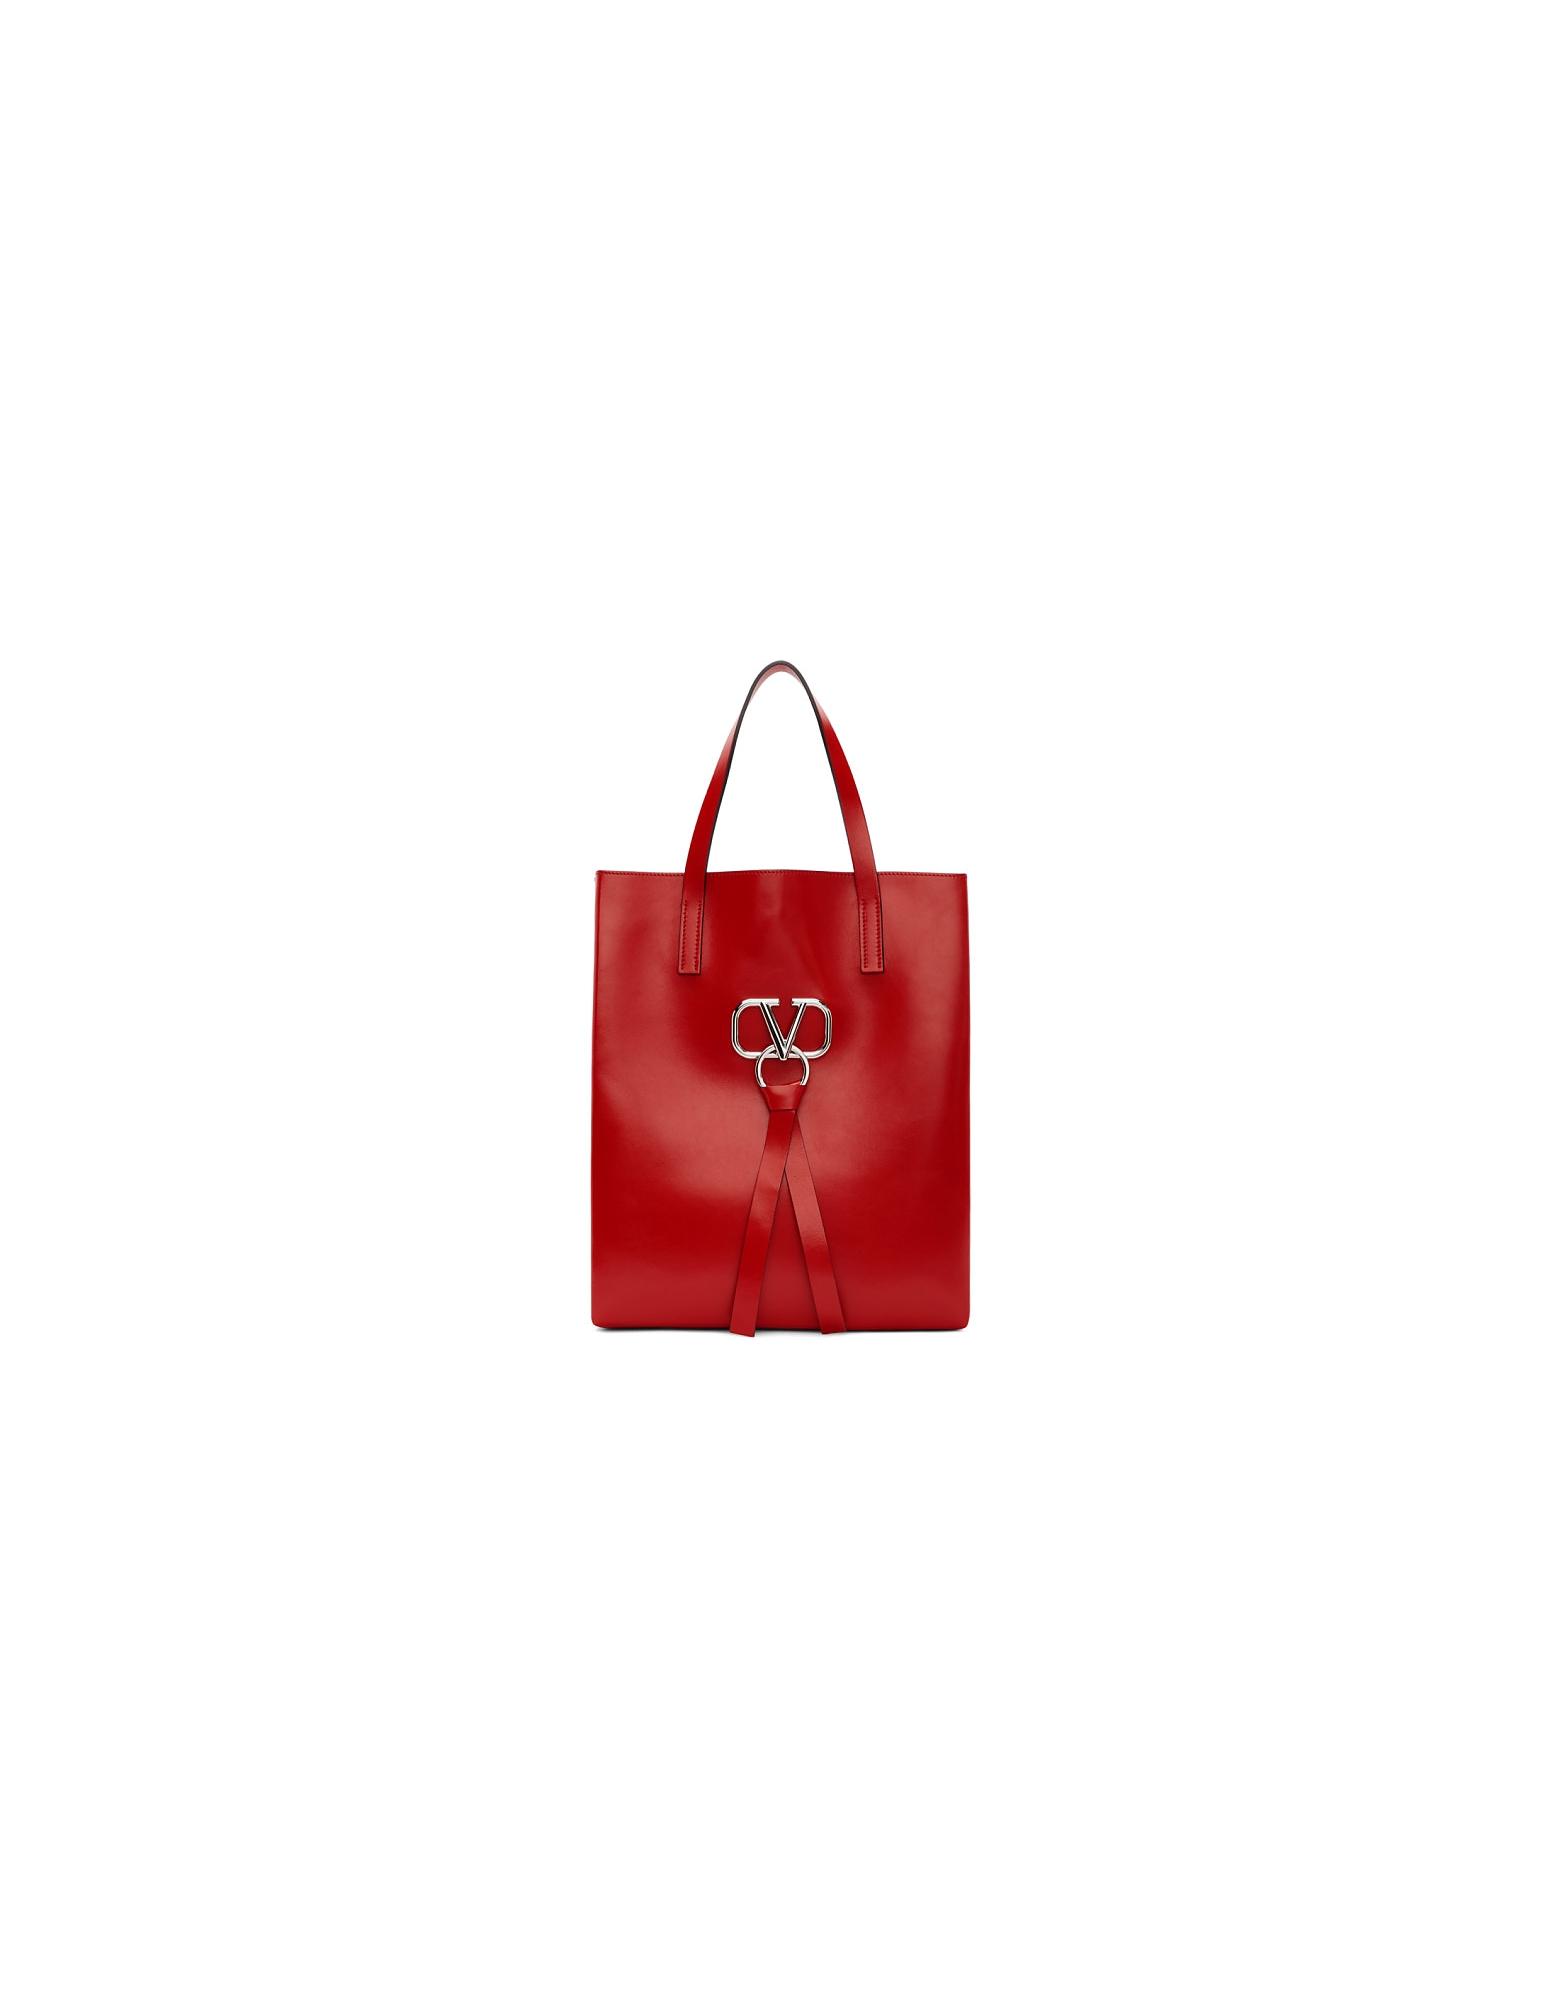 Valentino Designer Men's Bags, Red Valentino Garavani VRing Tote